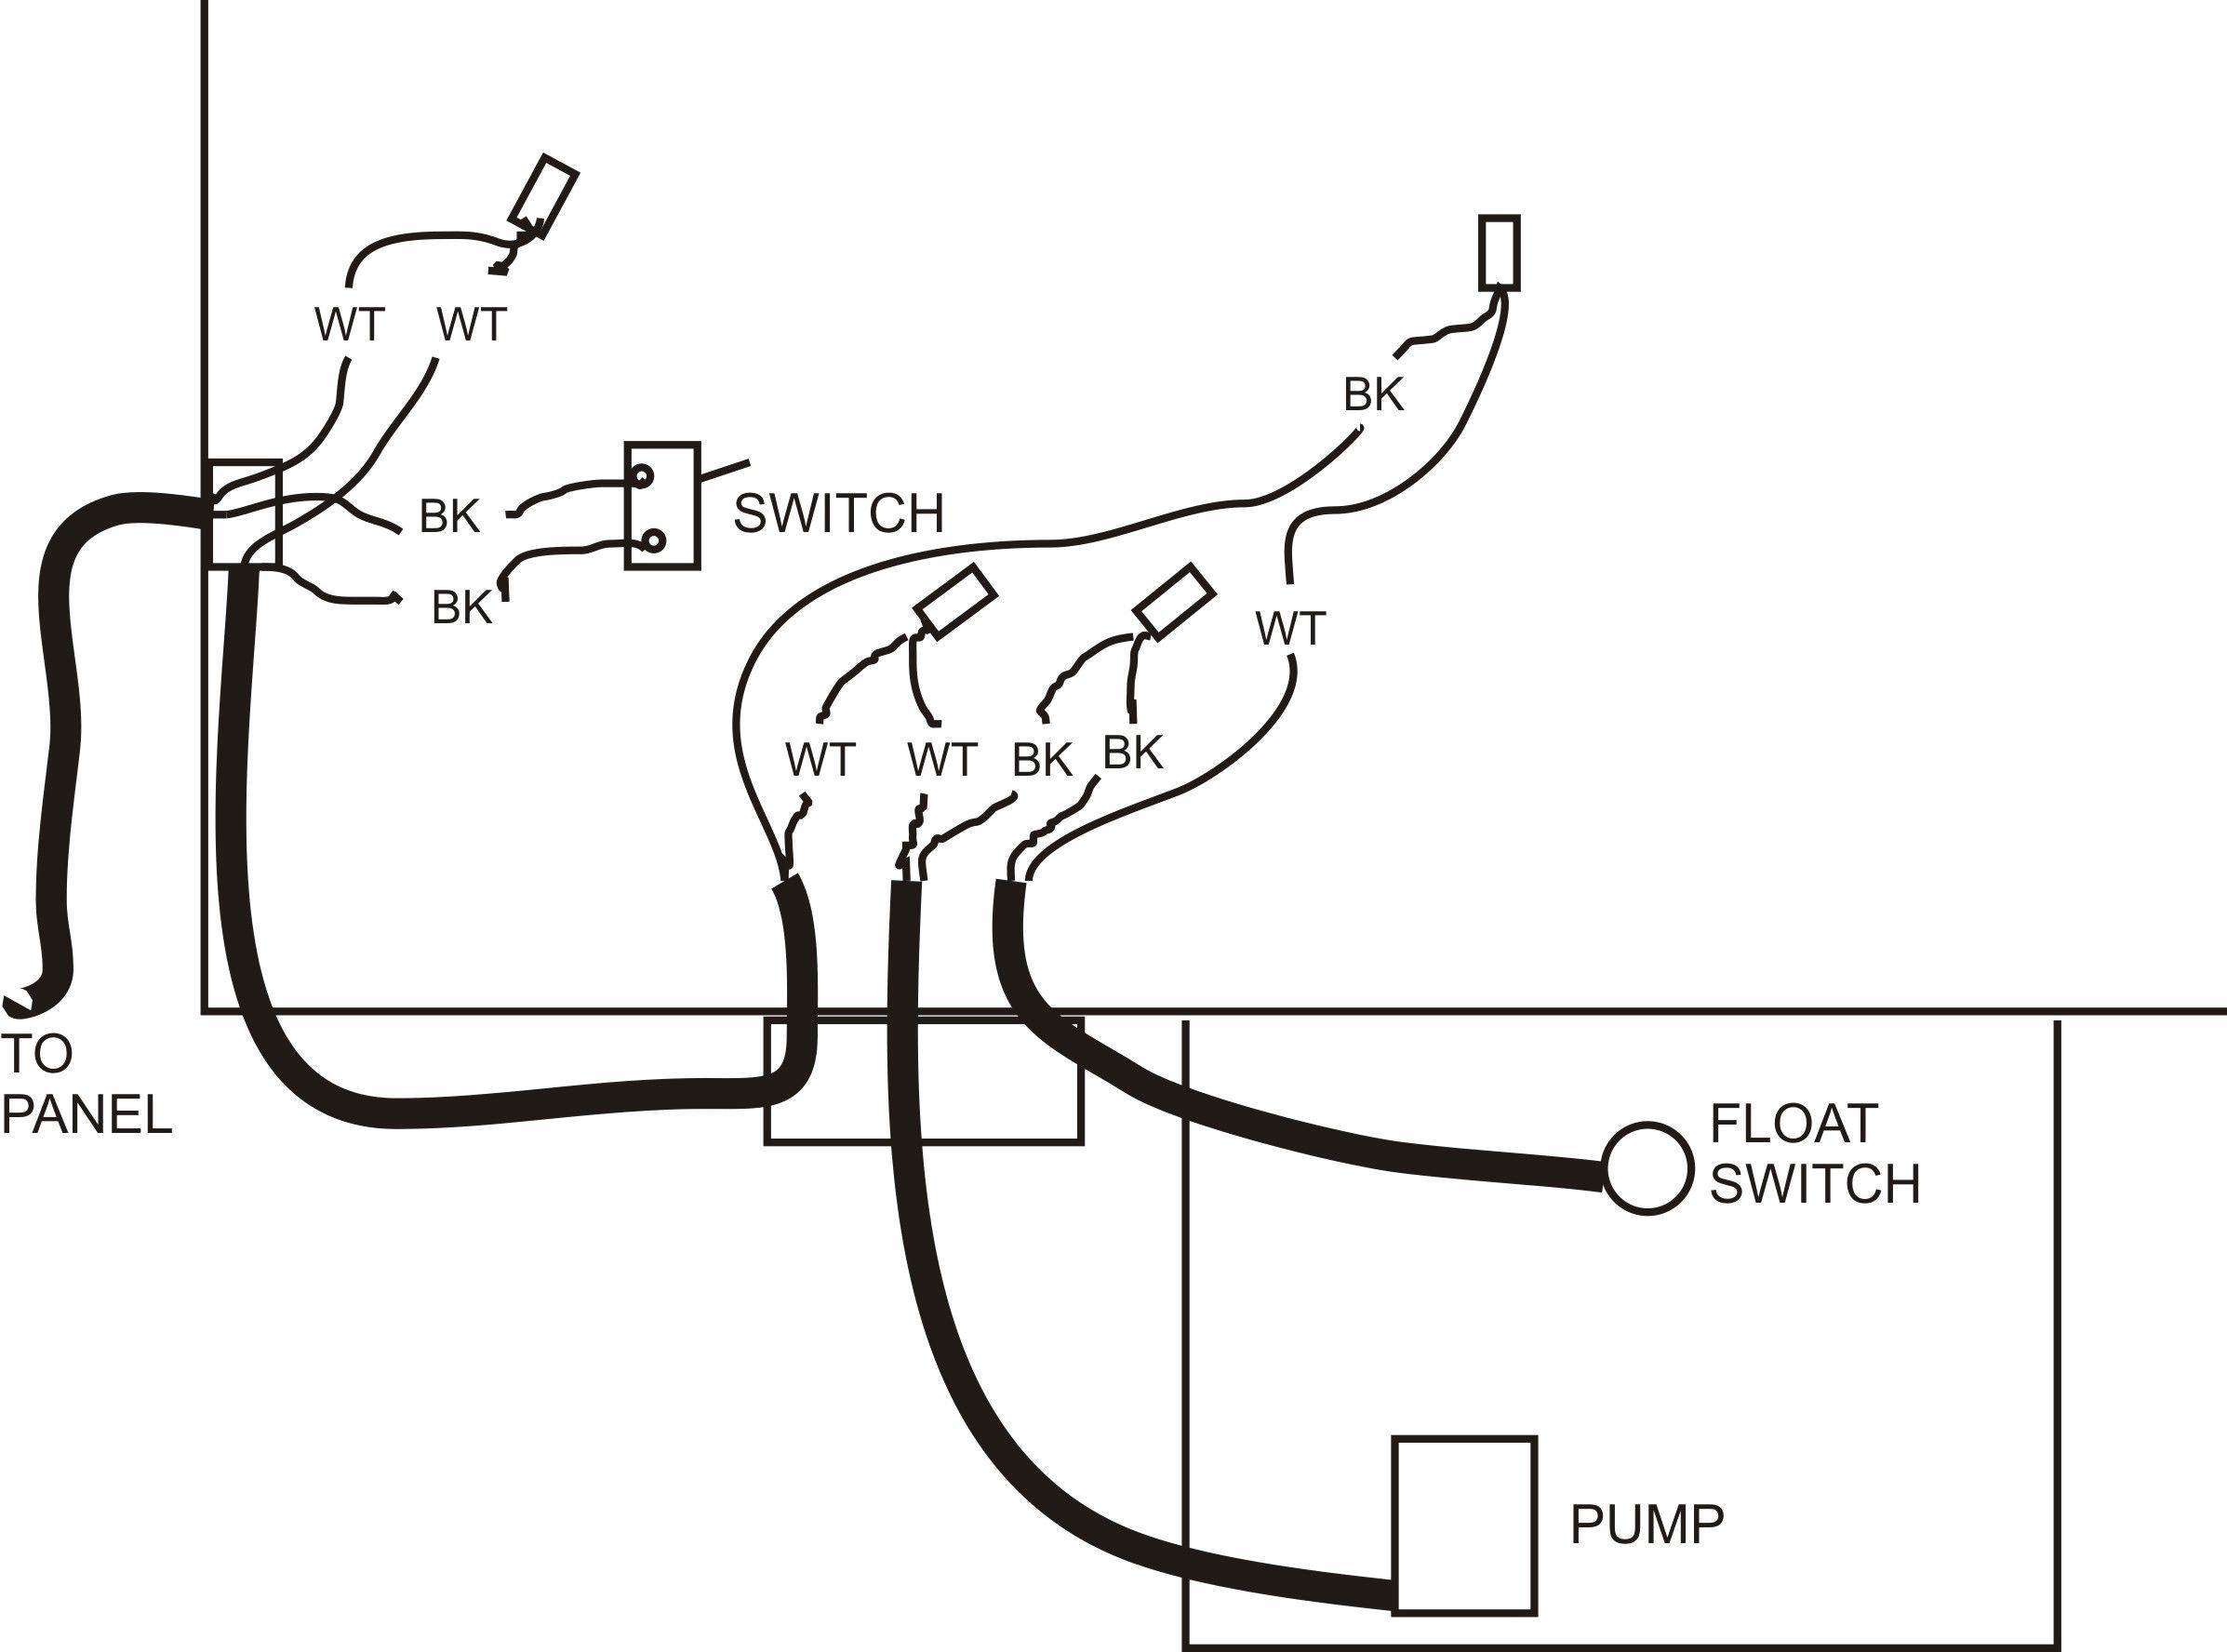 diagram] control wiring diagram septic tank alarm full version hd quality  tank alarm - pocdiagram.mondemodexl.fr  mondemode